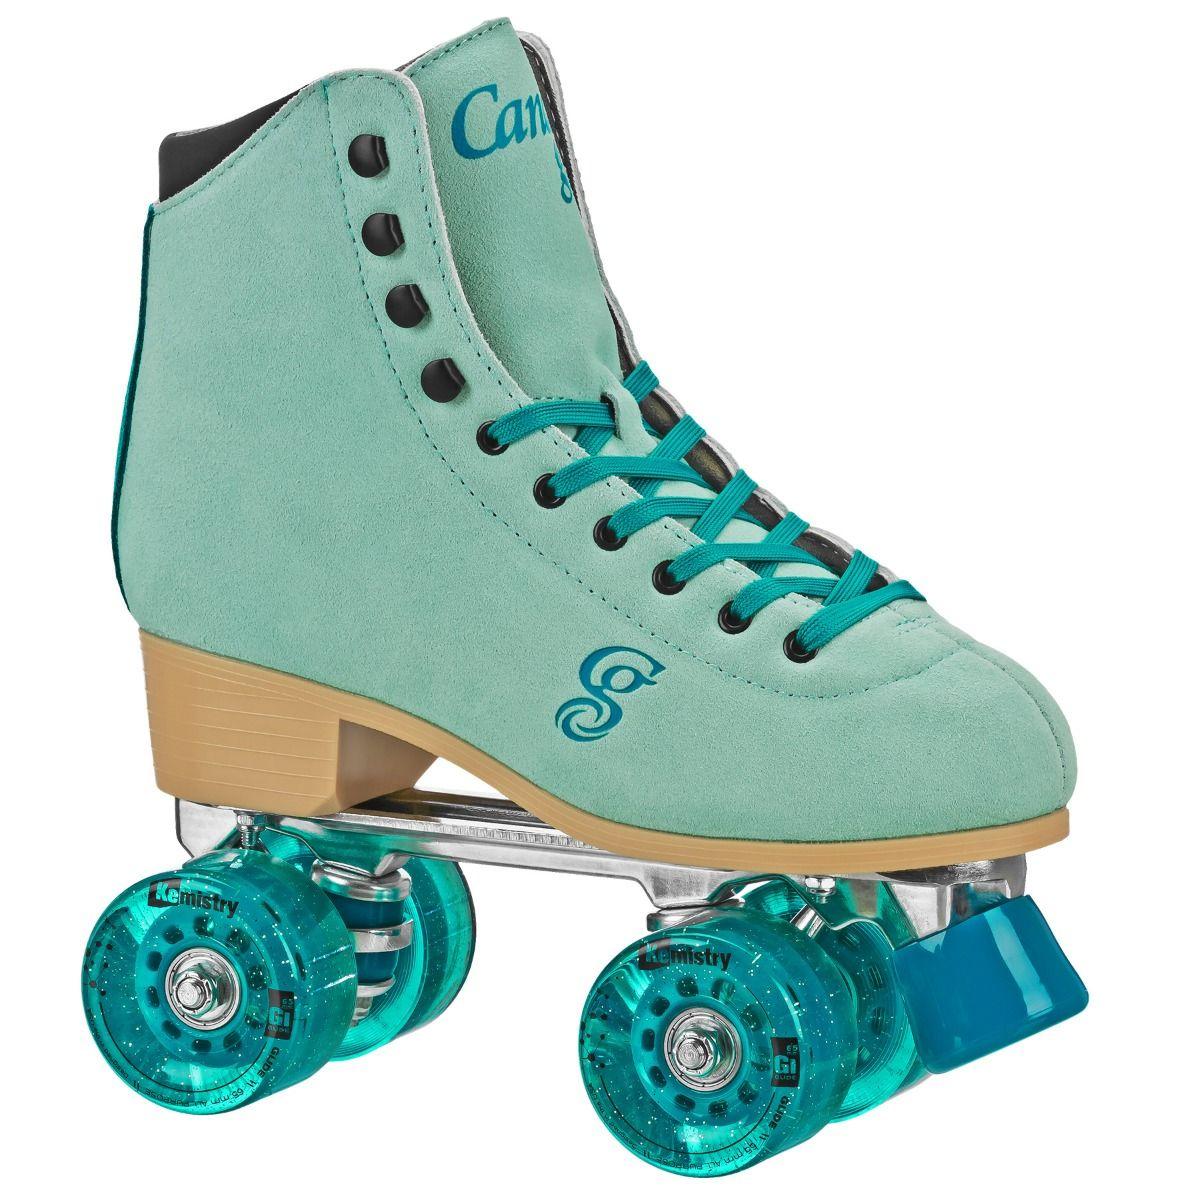 INSTOCK! Candi Girl Carlin Green/Blue Suede Outdoor Roller Skates!